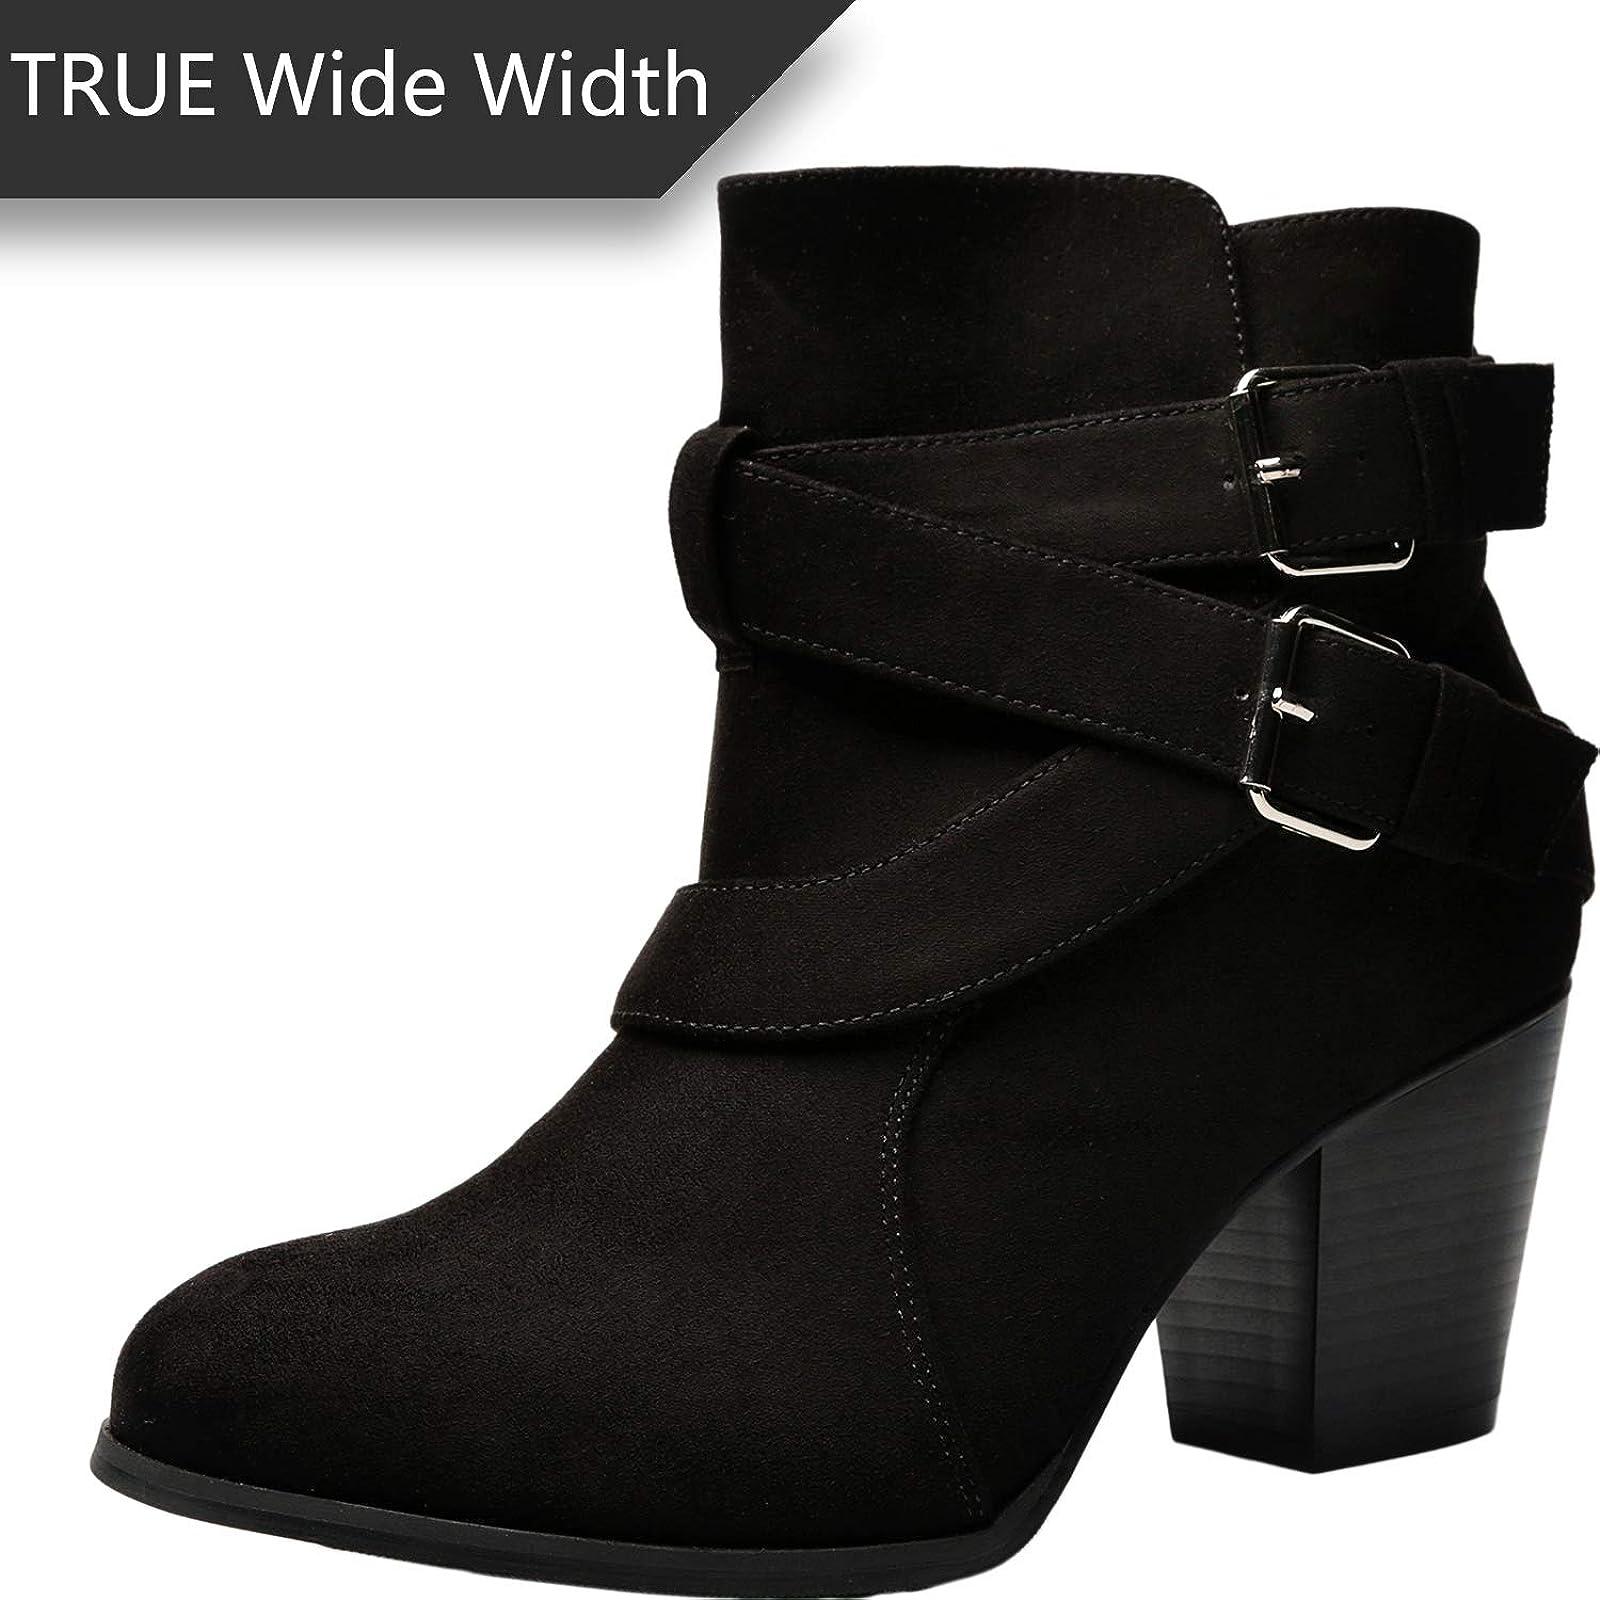 Luoika Women's Wide Width Ankle Boots - Black 10 XW US - 7